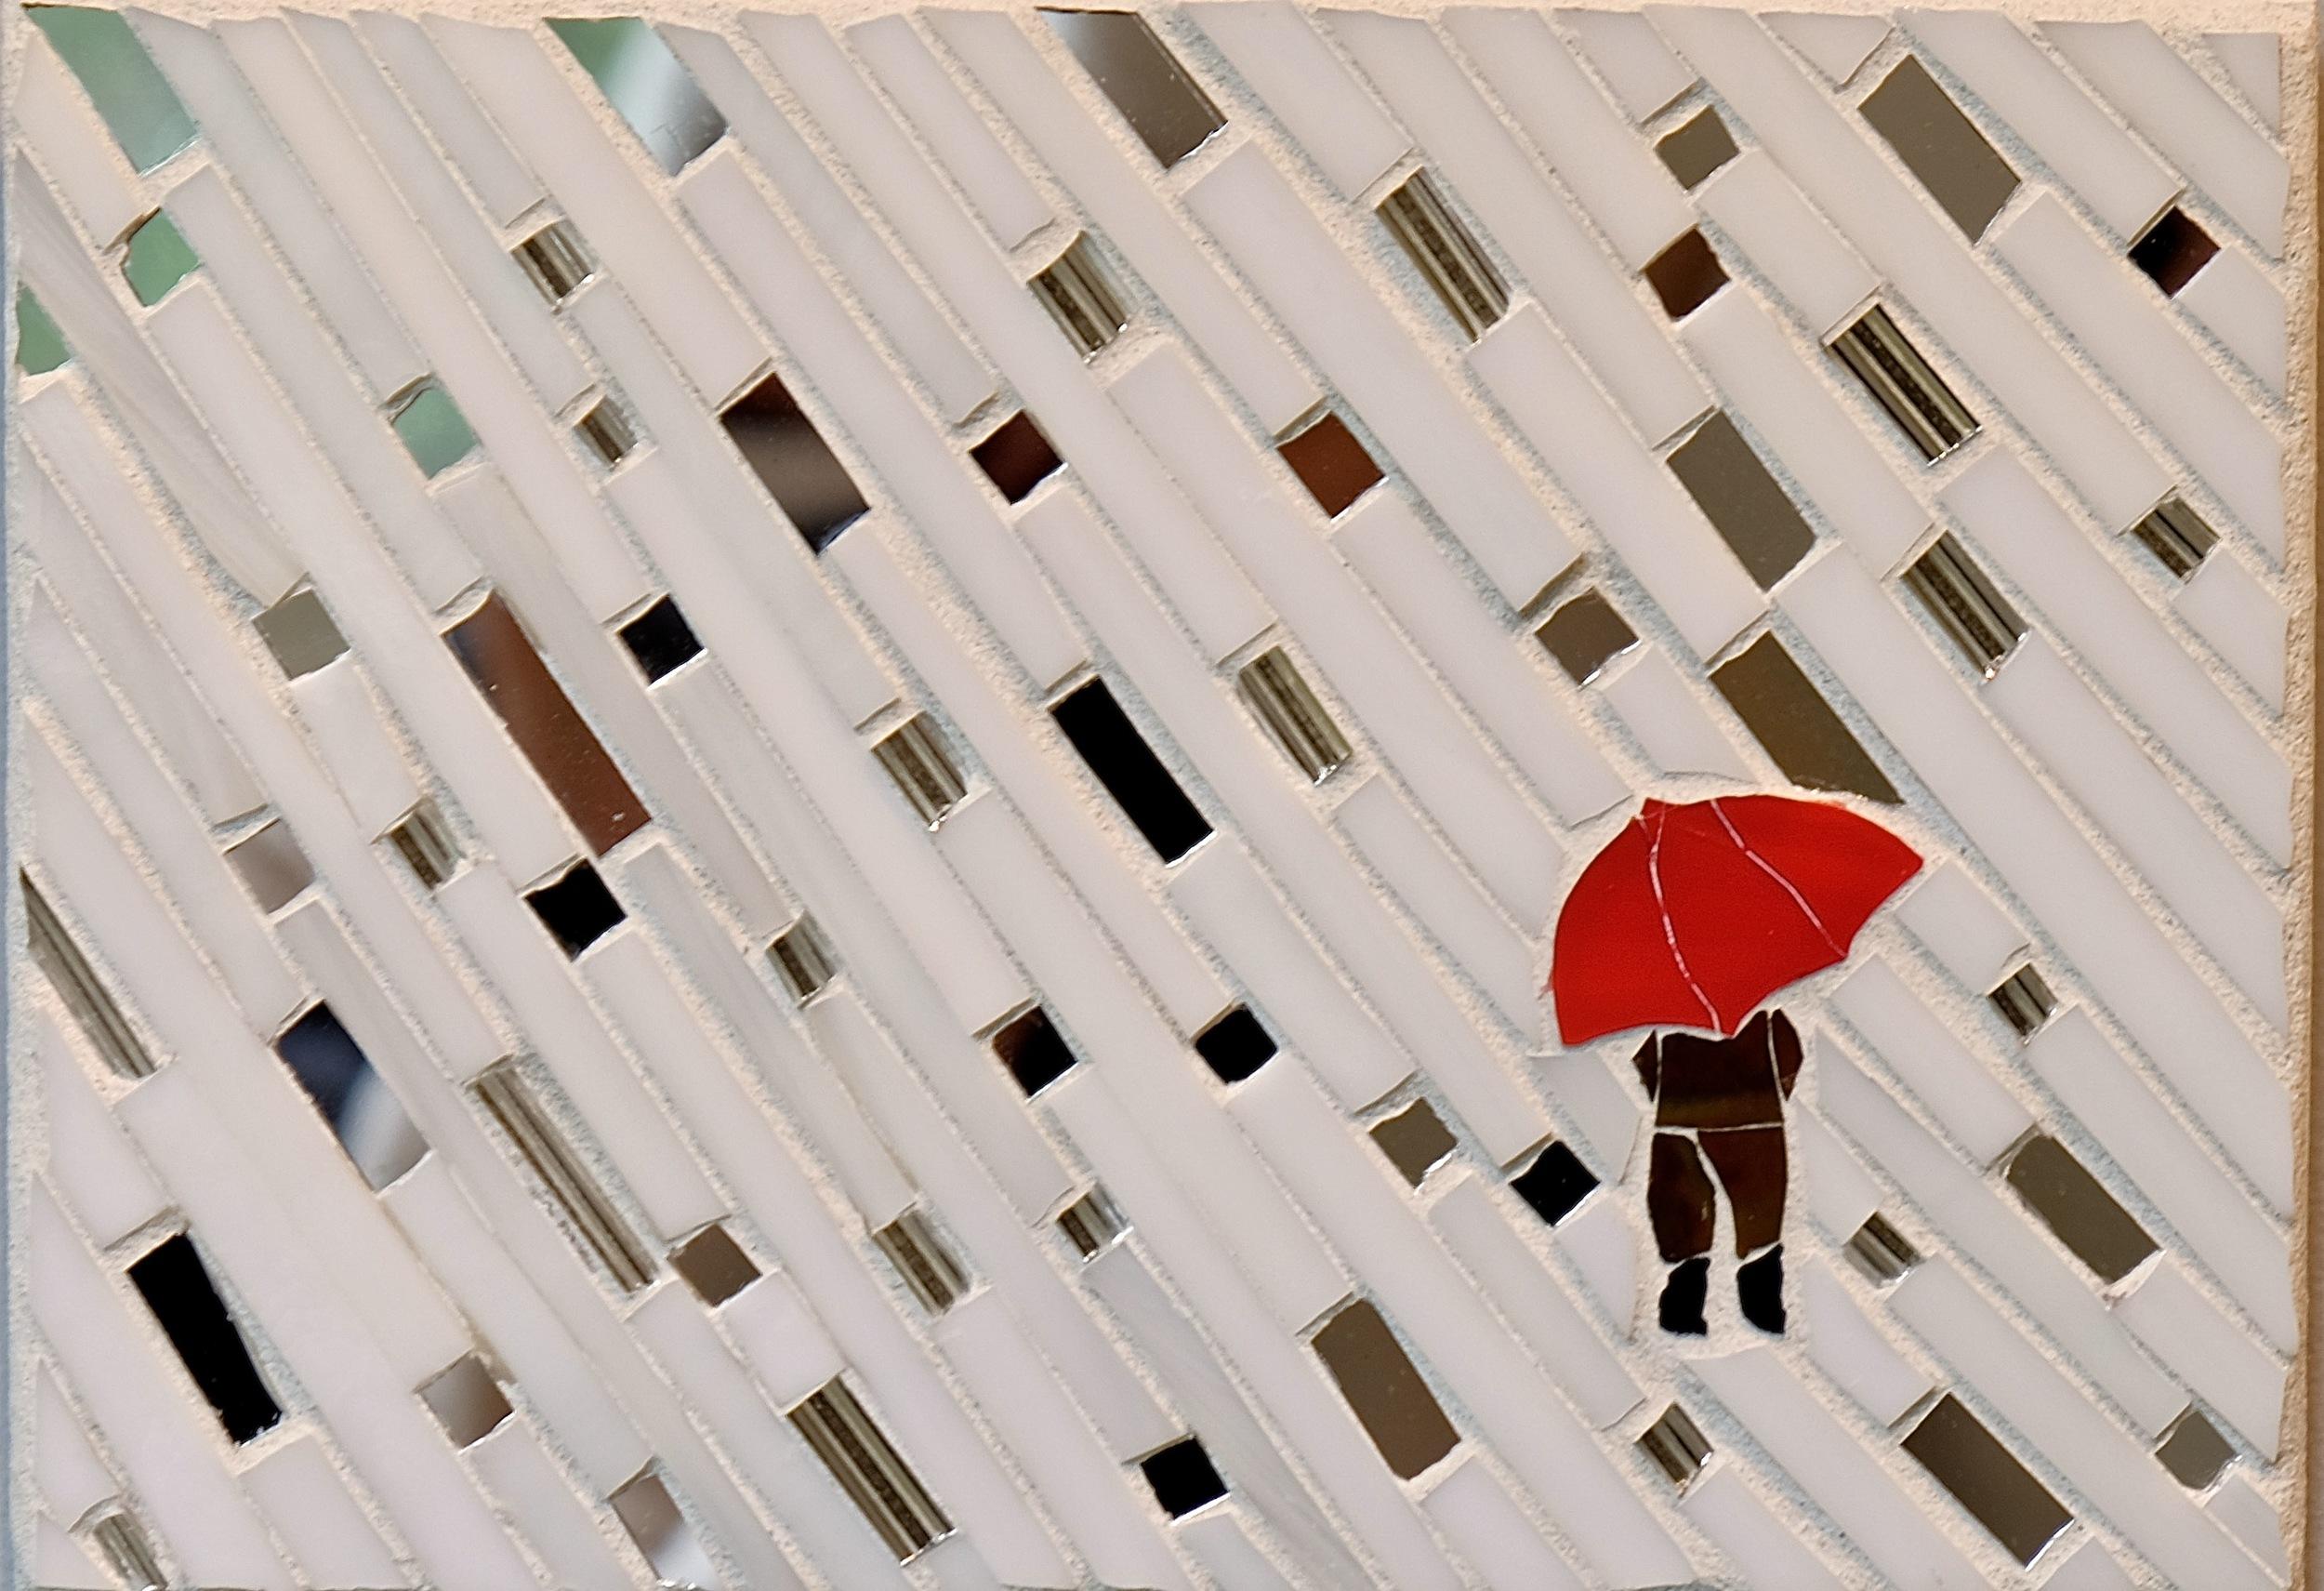 Rainy Day Solitude